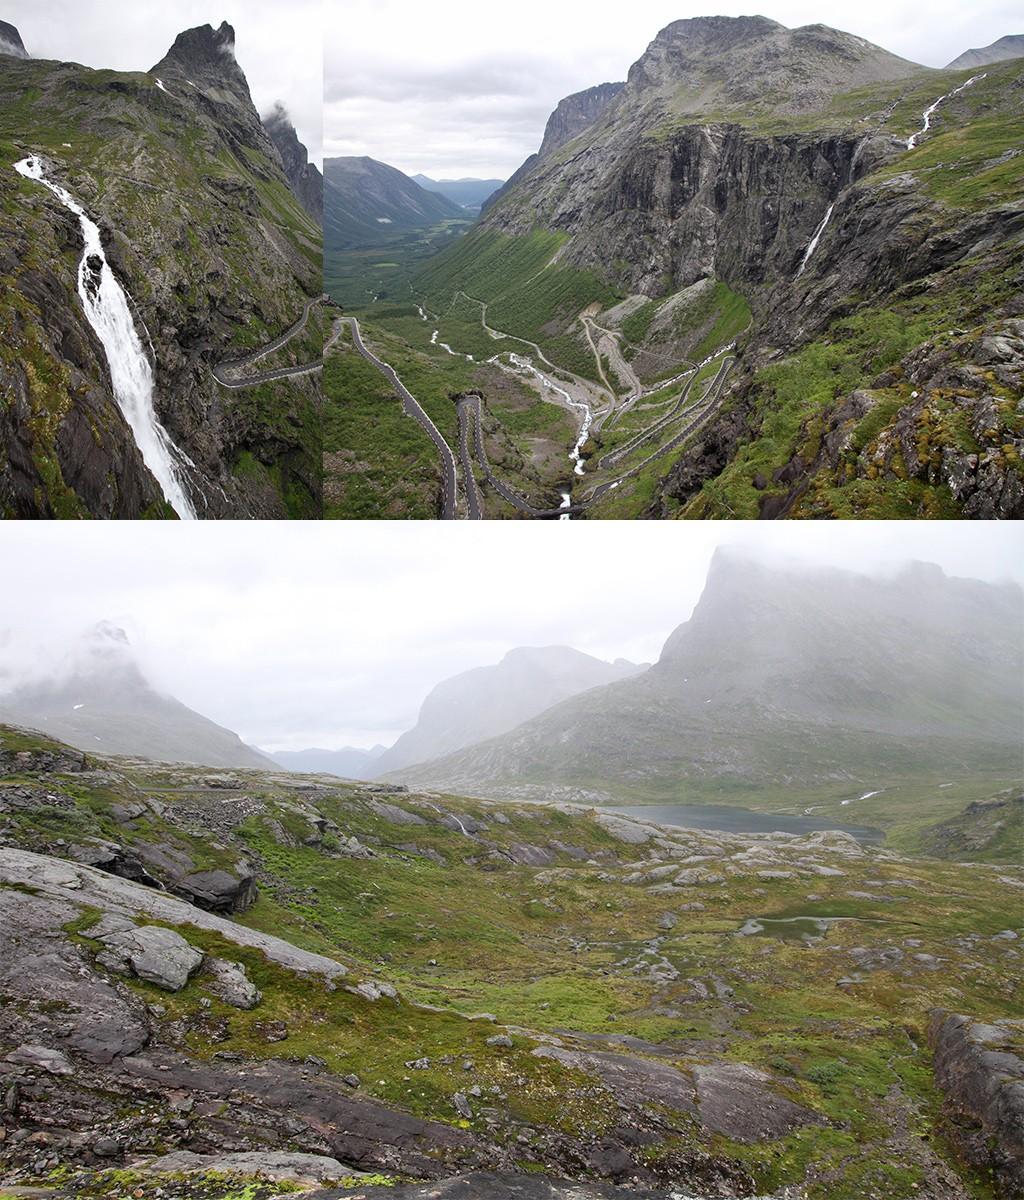 mooiste fjorden Noorwegen - Trollstigen